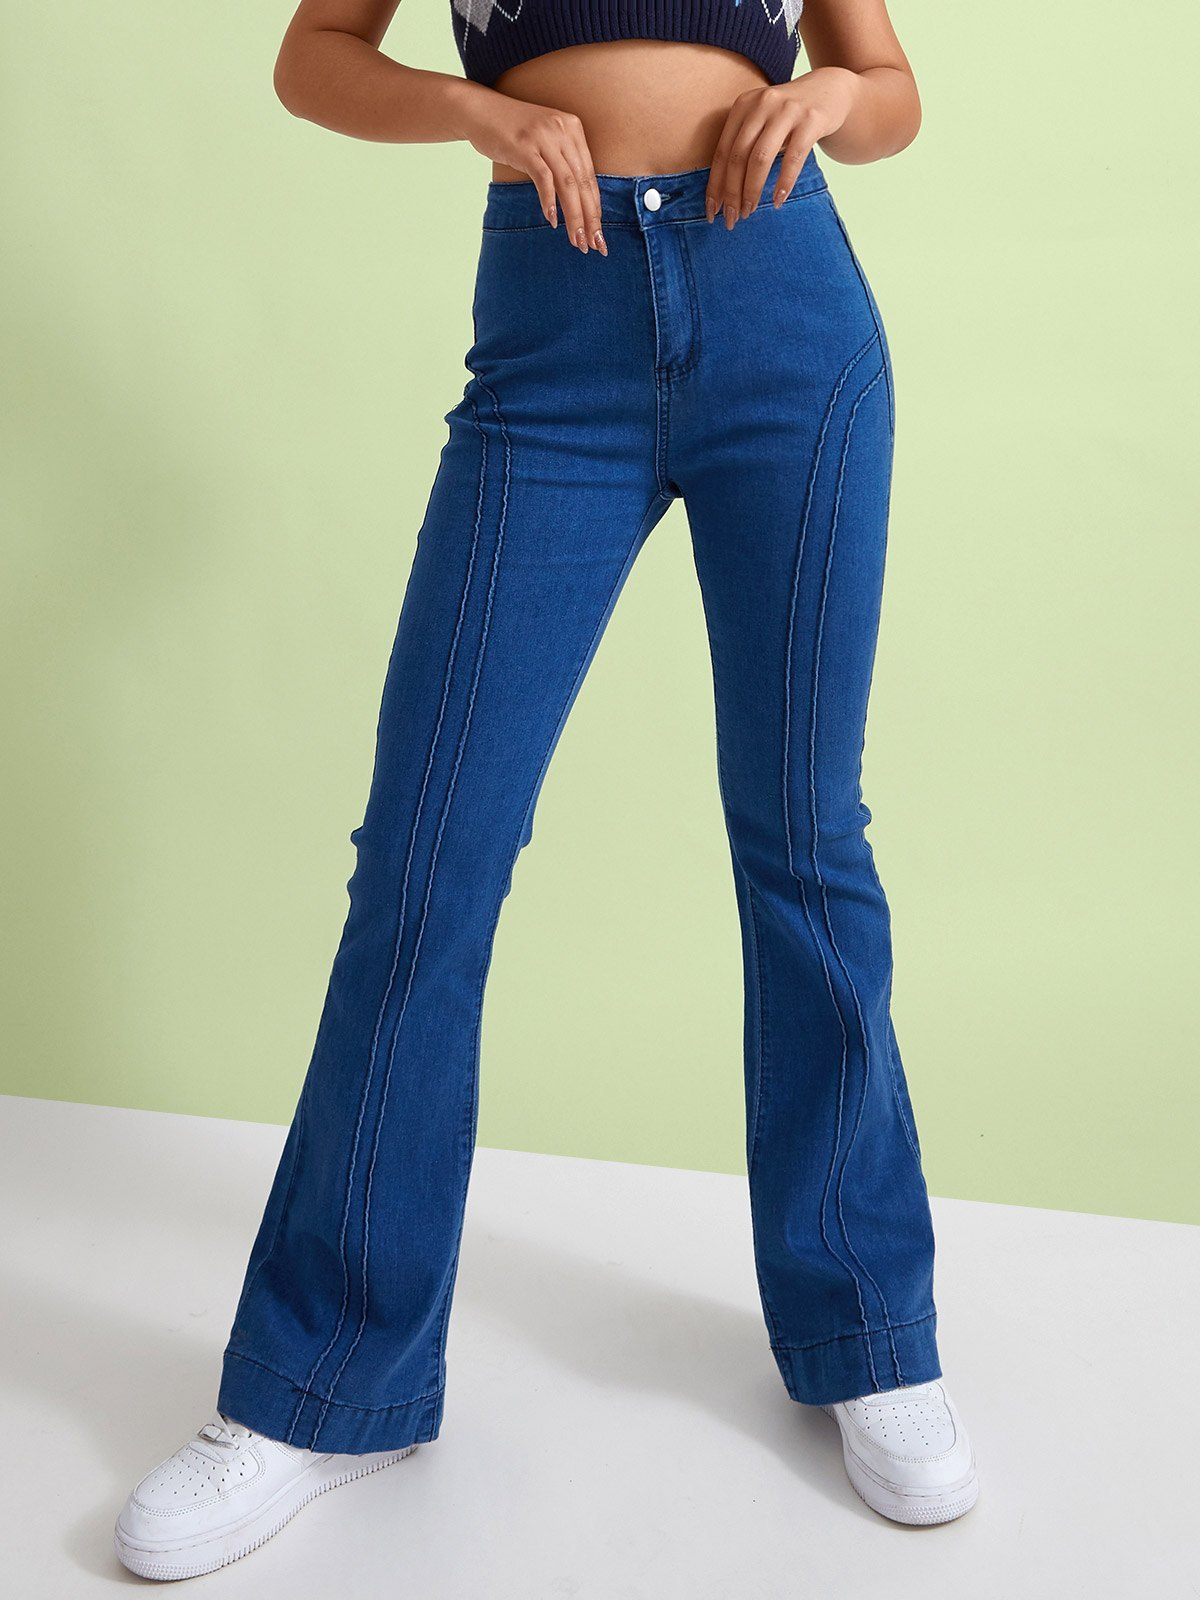 Vintage Mid Rise Slim Jeans - Blue S